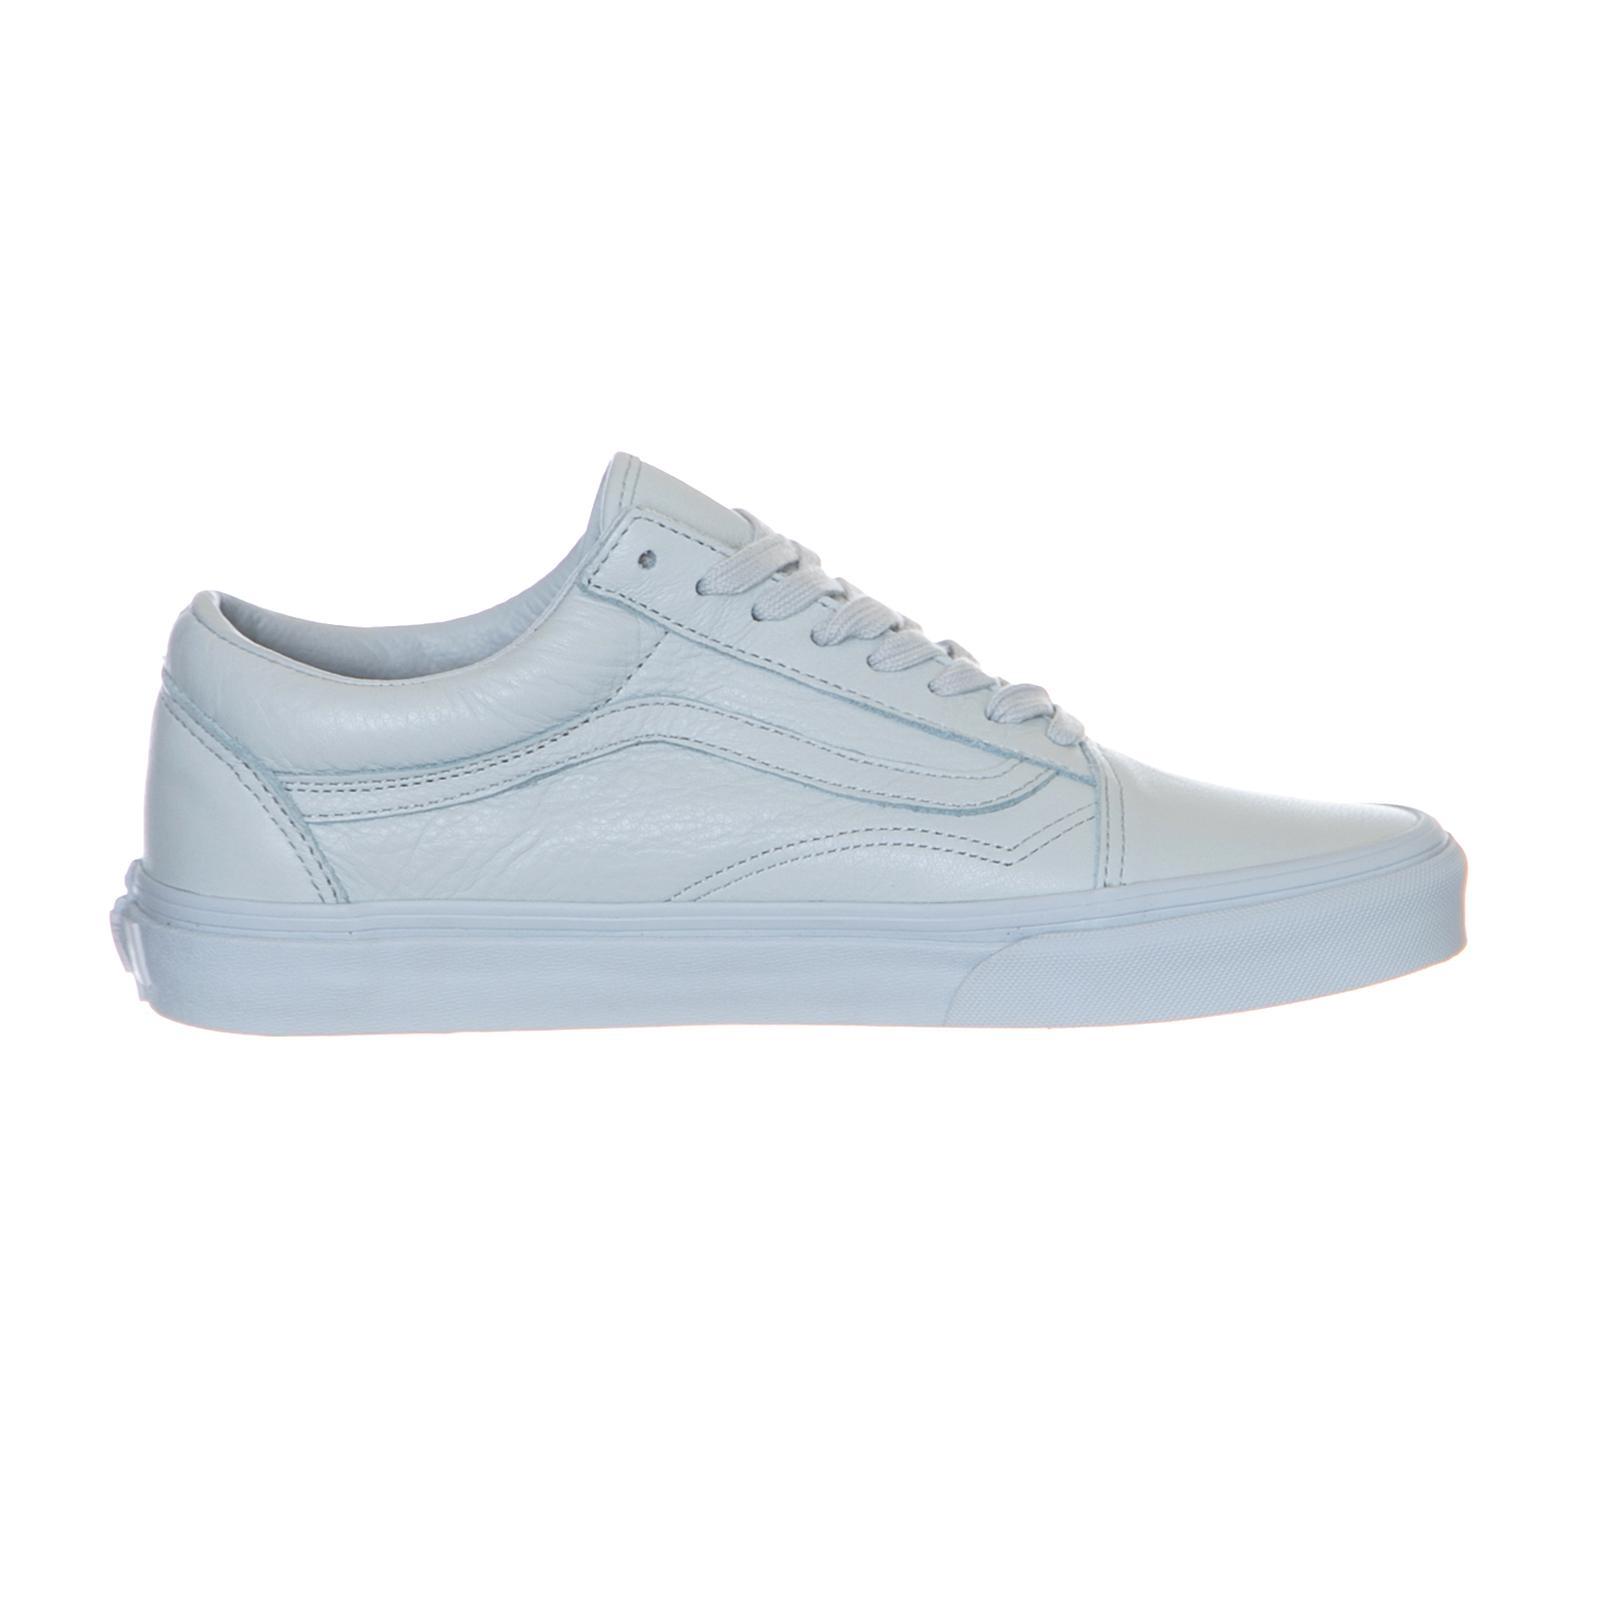 finest selection 2aba2 b4594 ... Vans Sneakers Ua Old Skool (Leather) Mo Azzurro ...